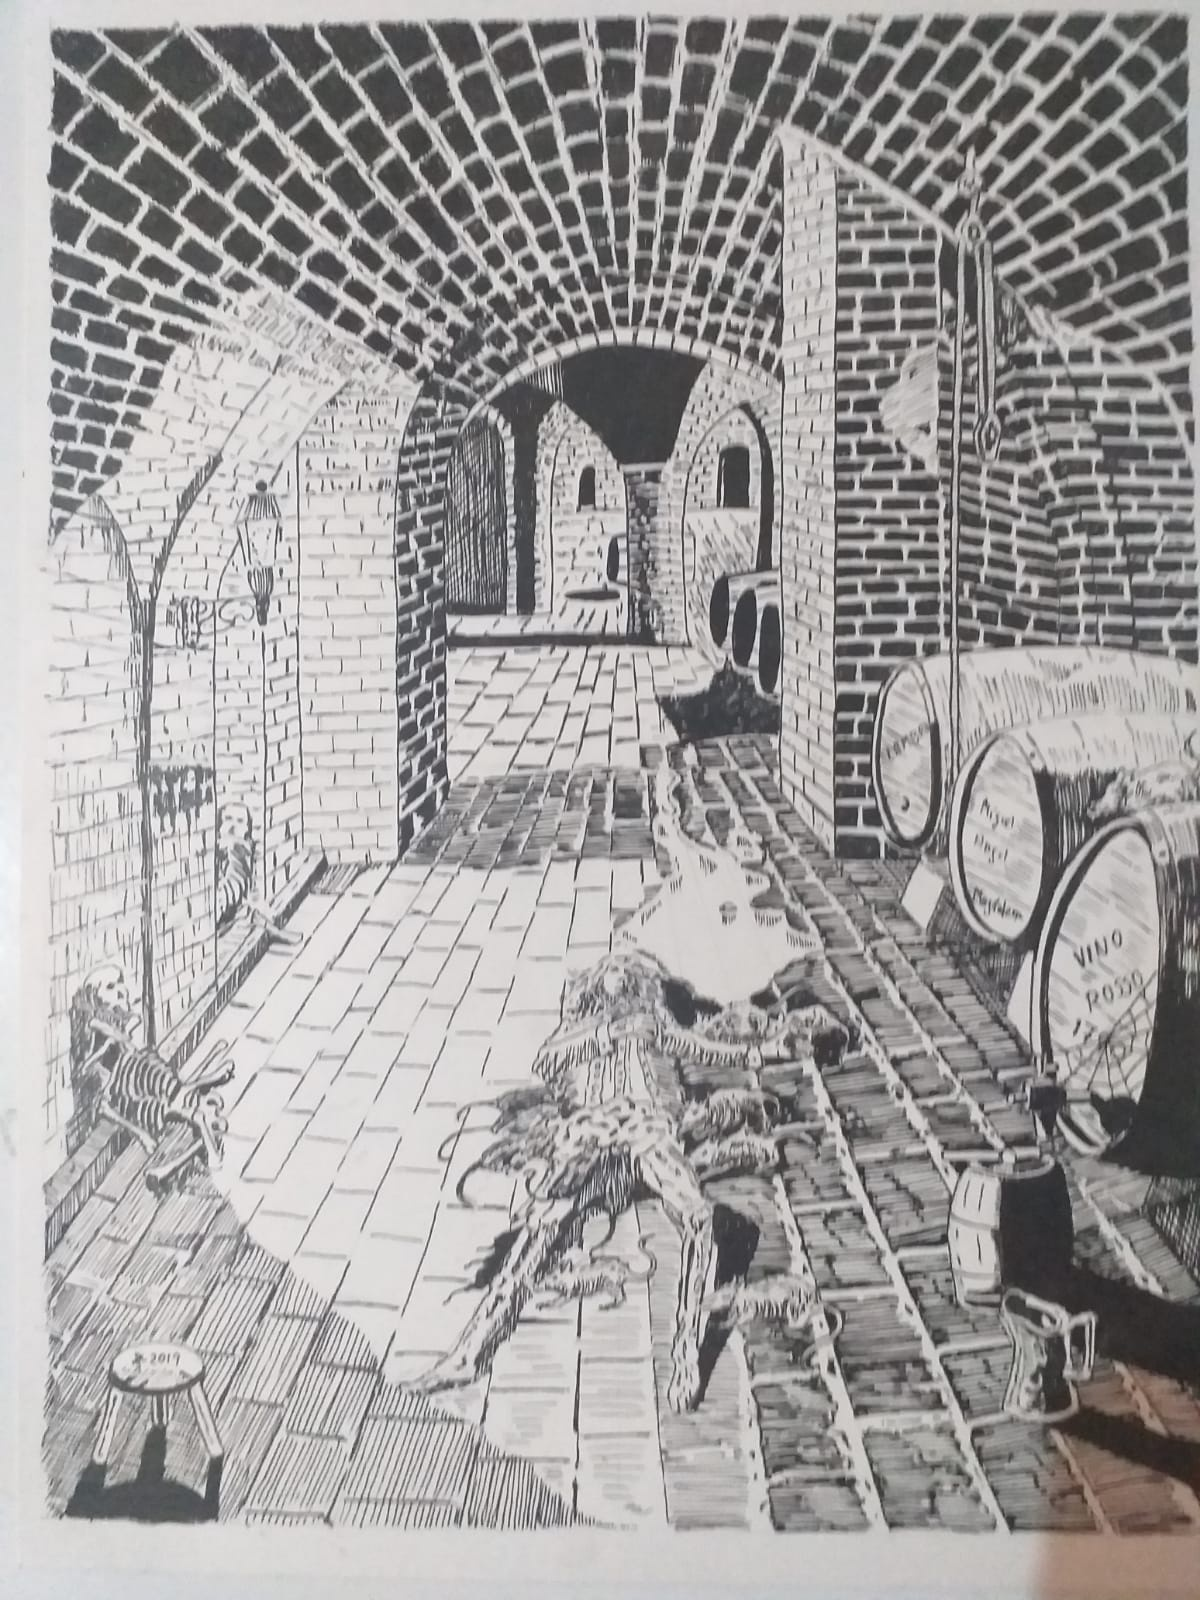 Banquet in the cellar